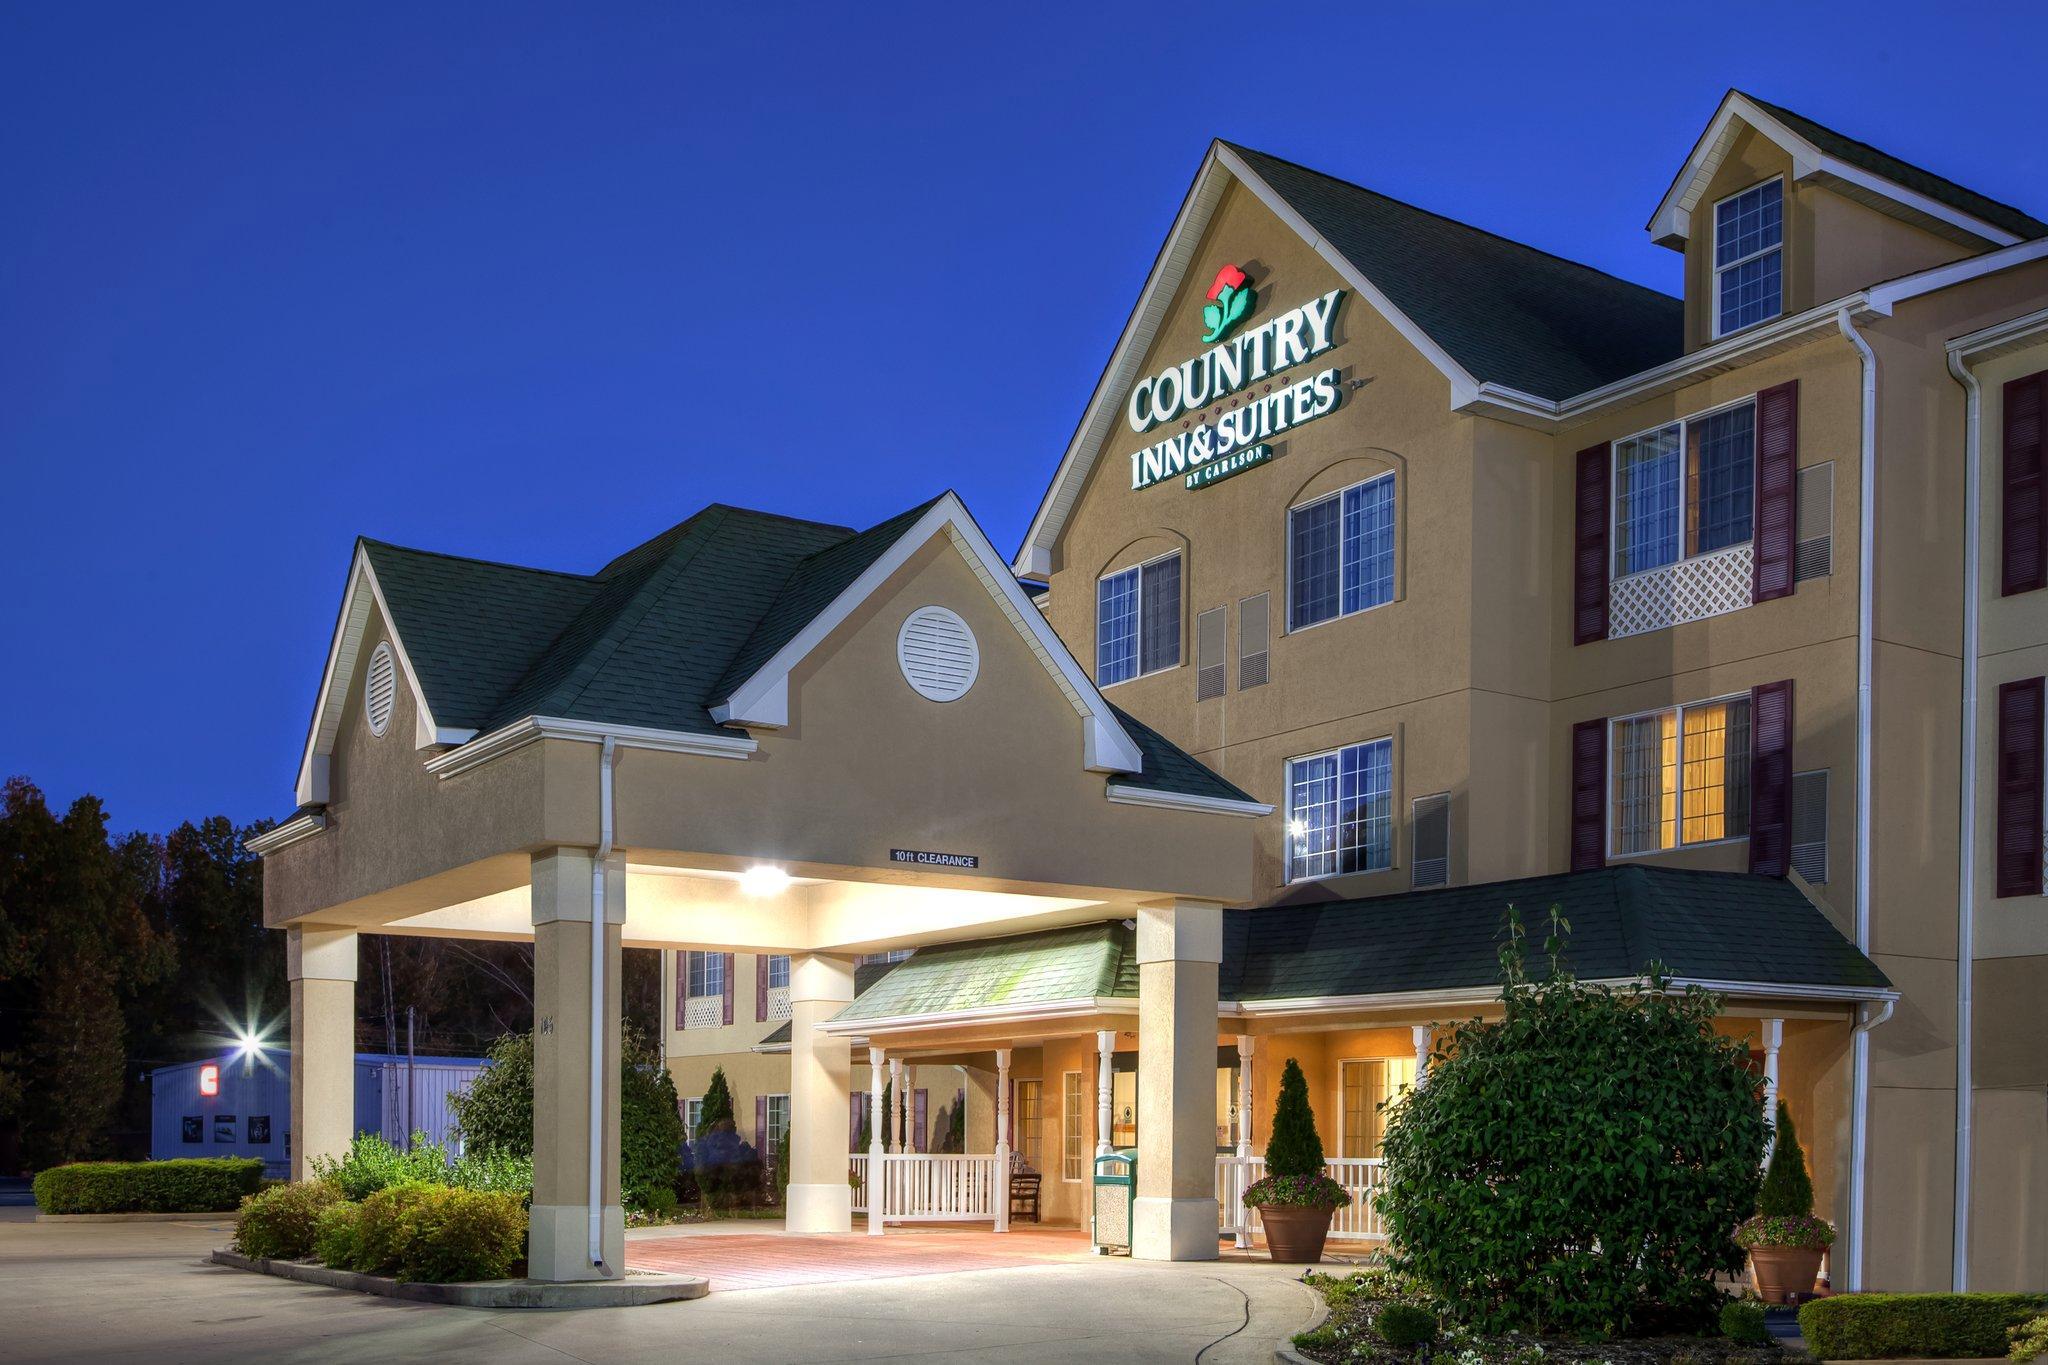 Country Inn & Suites By Carlson, Paducah